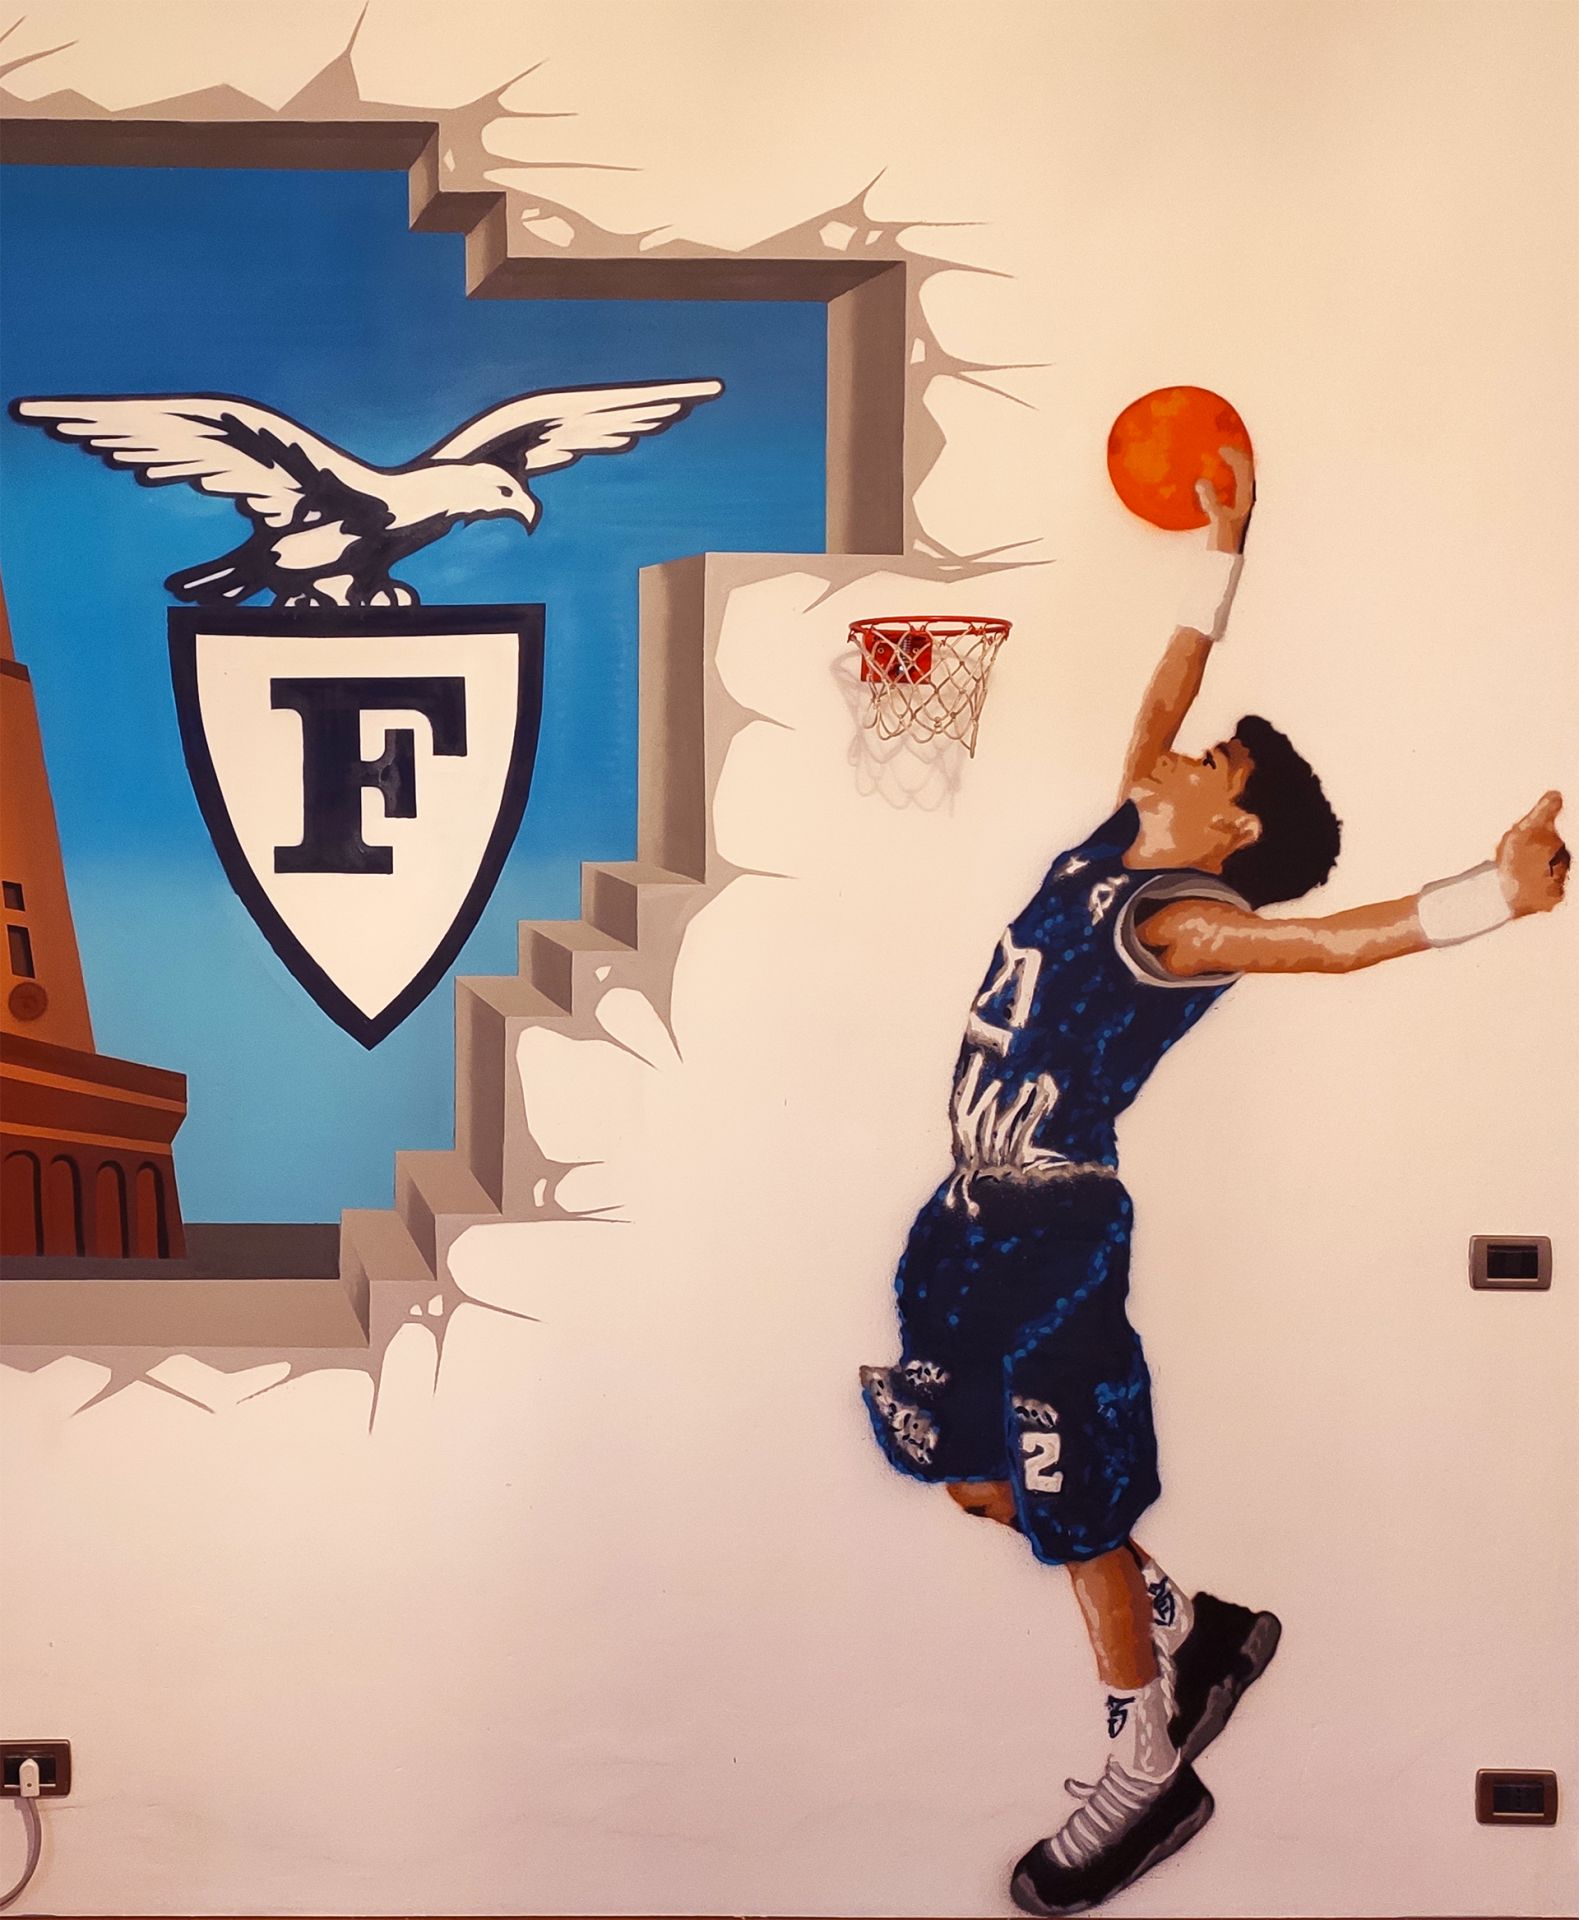 Giorgio on the wall!